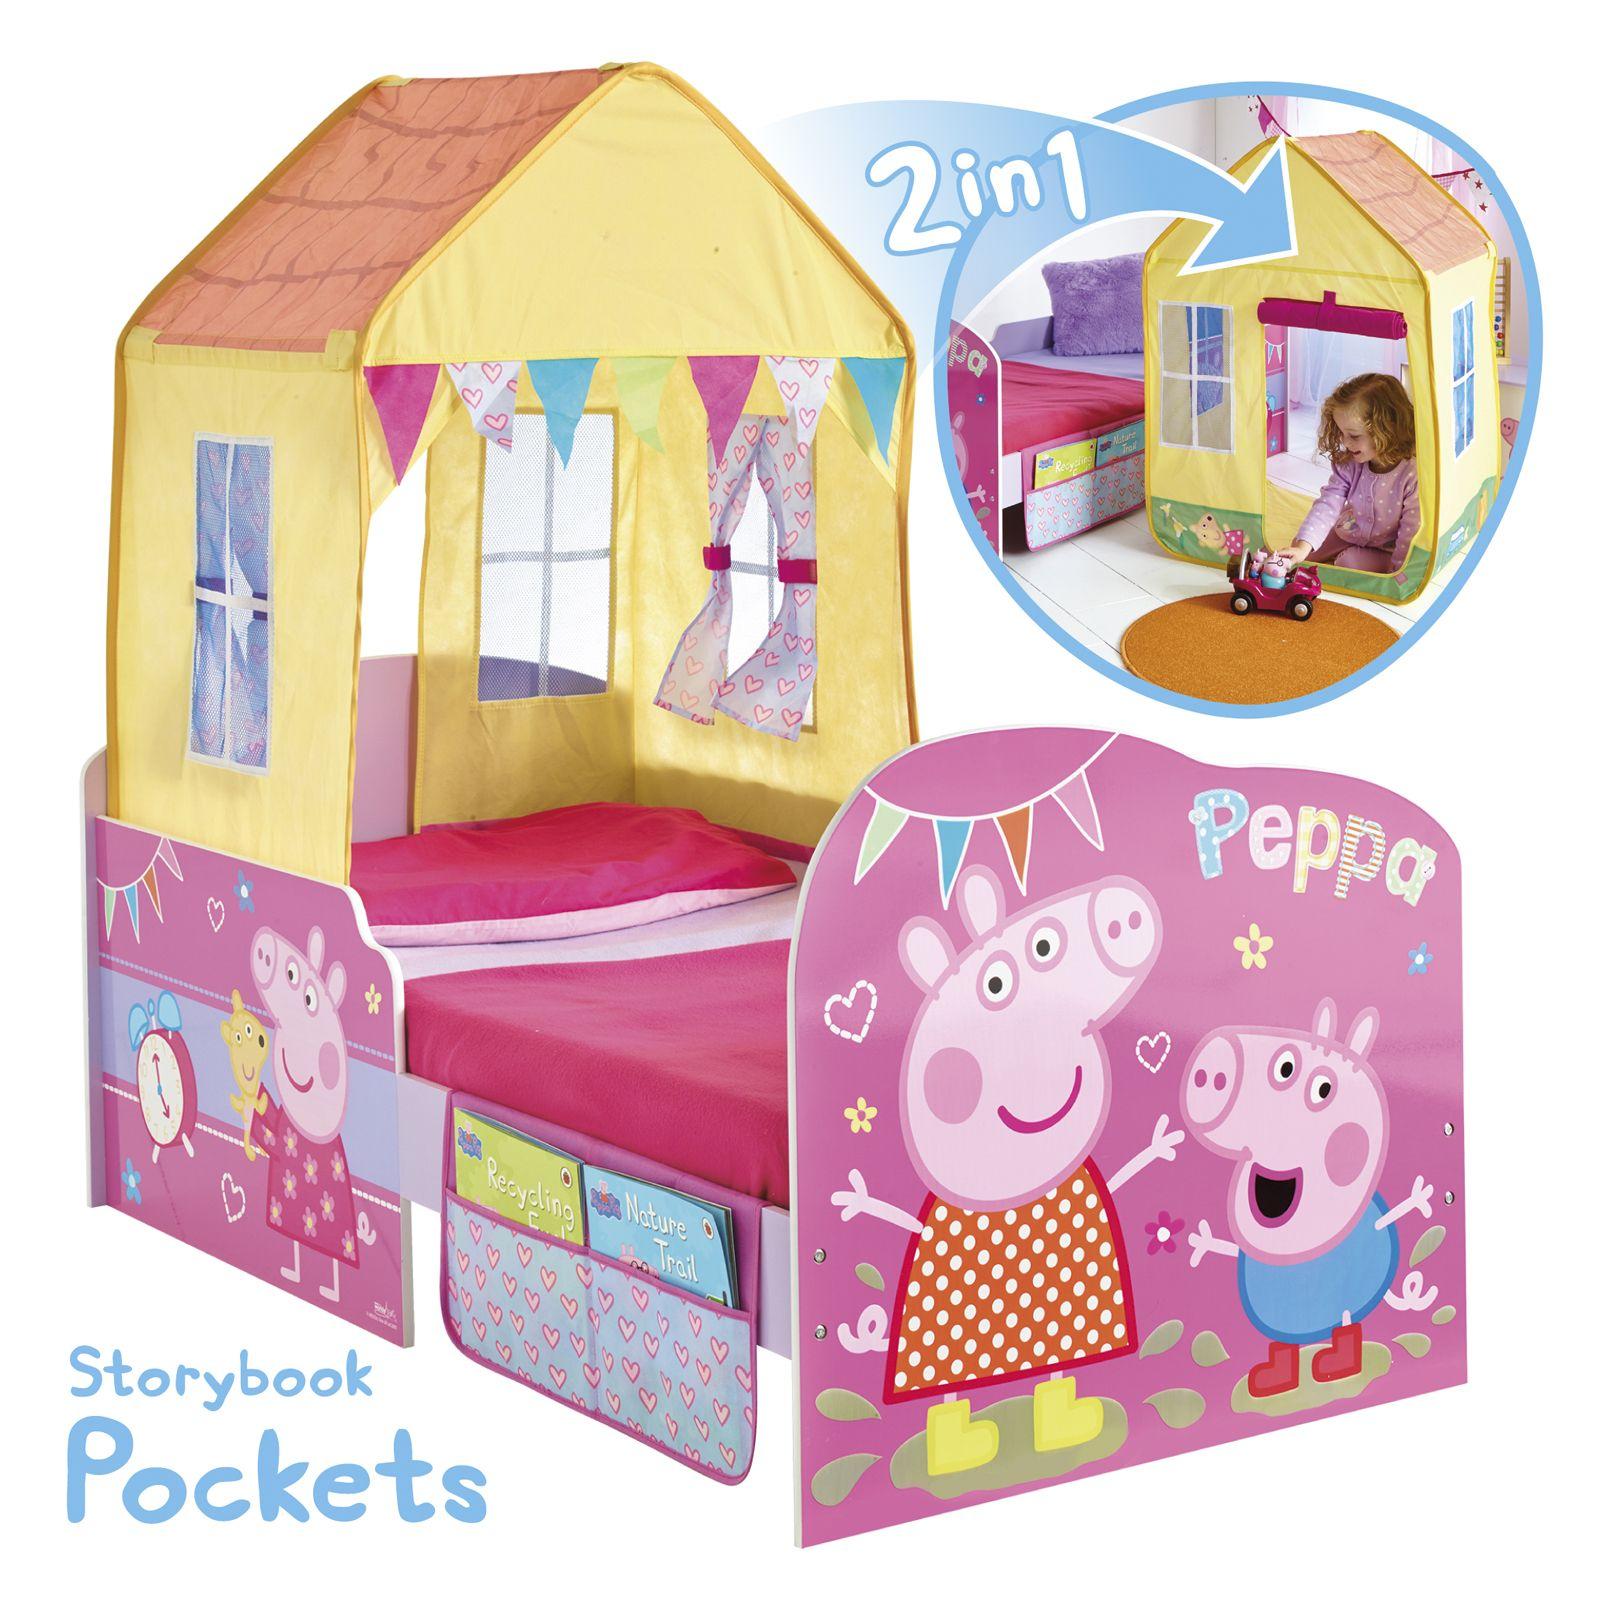 Peppa Pig Bedroom Ideas Xtreme Wheelz. Peppa Pig Bedroom Decor   Home Design